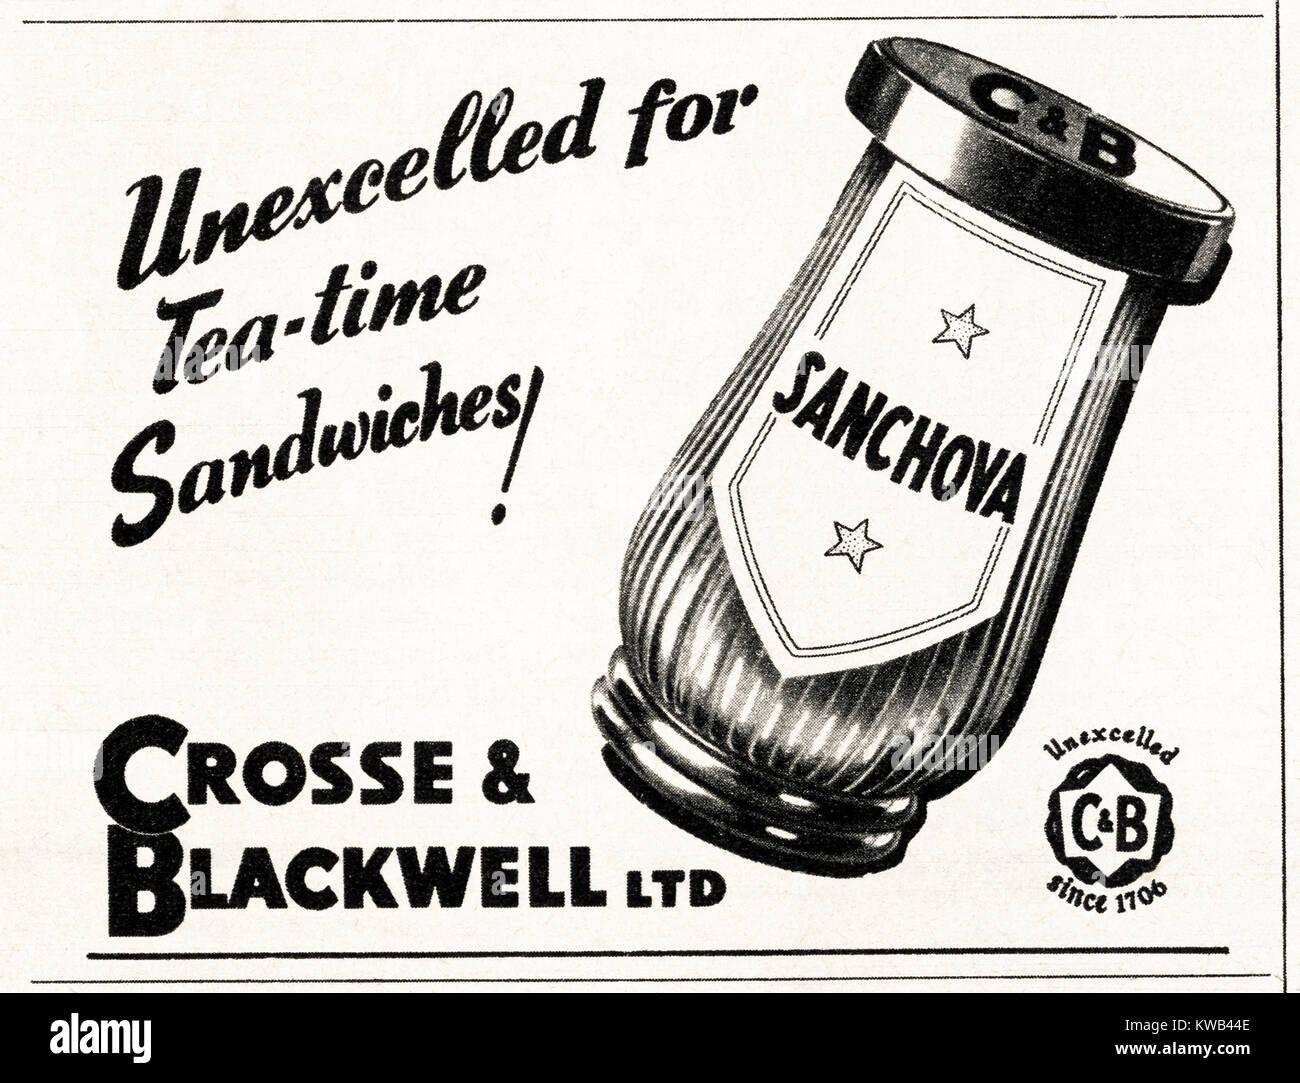 1940s old vintage original advert advertising Crosse & Blackwell Sanchova sandwich spread in magazine circa - Stock Image